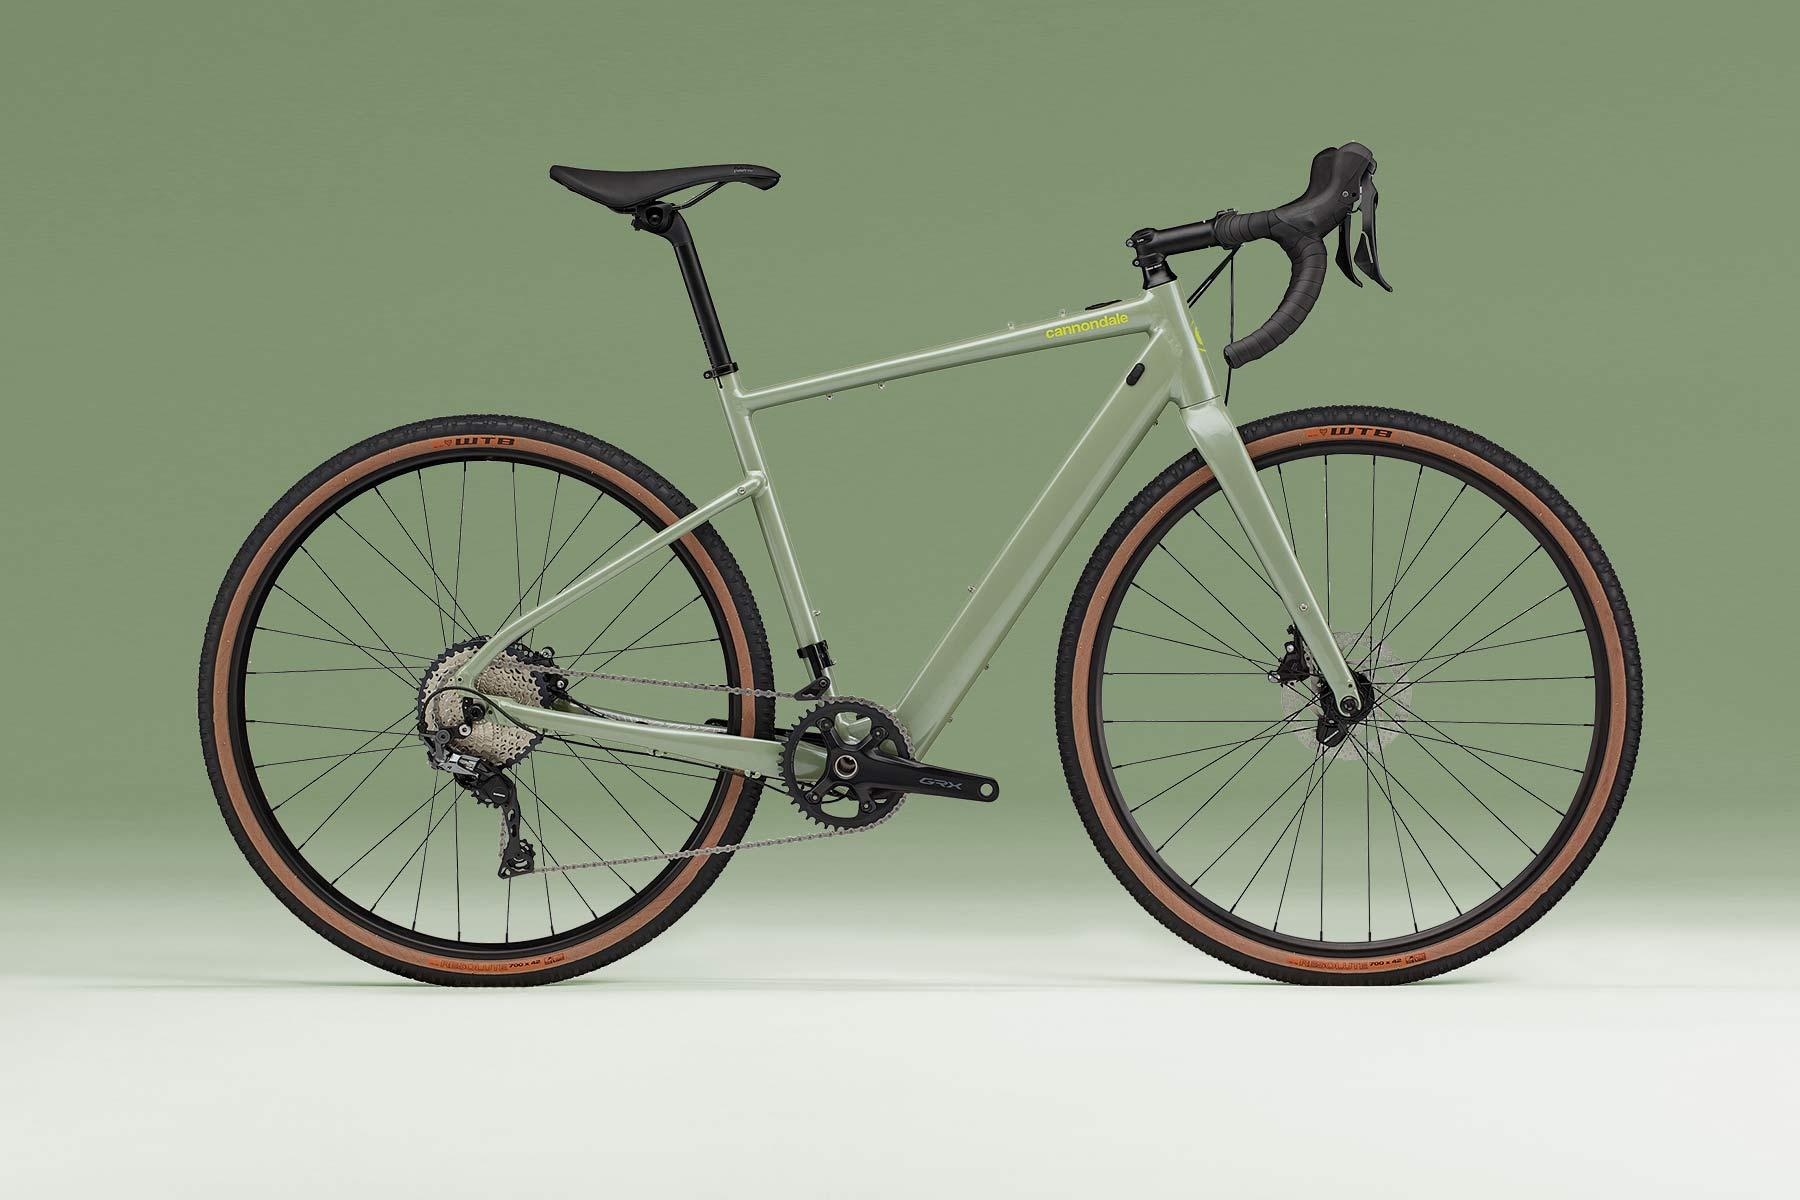 Cannondale Topstone Neo SL lightweight affordable alloy gravel e-bike